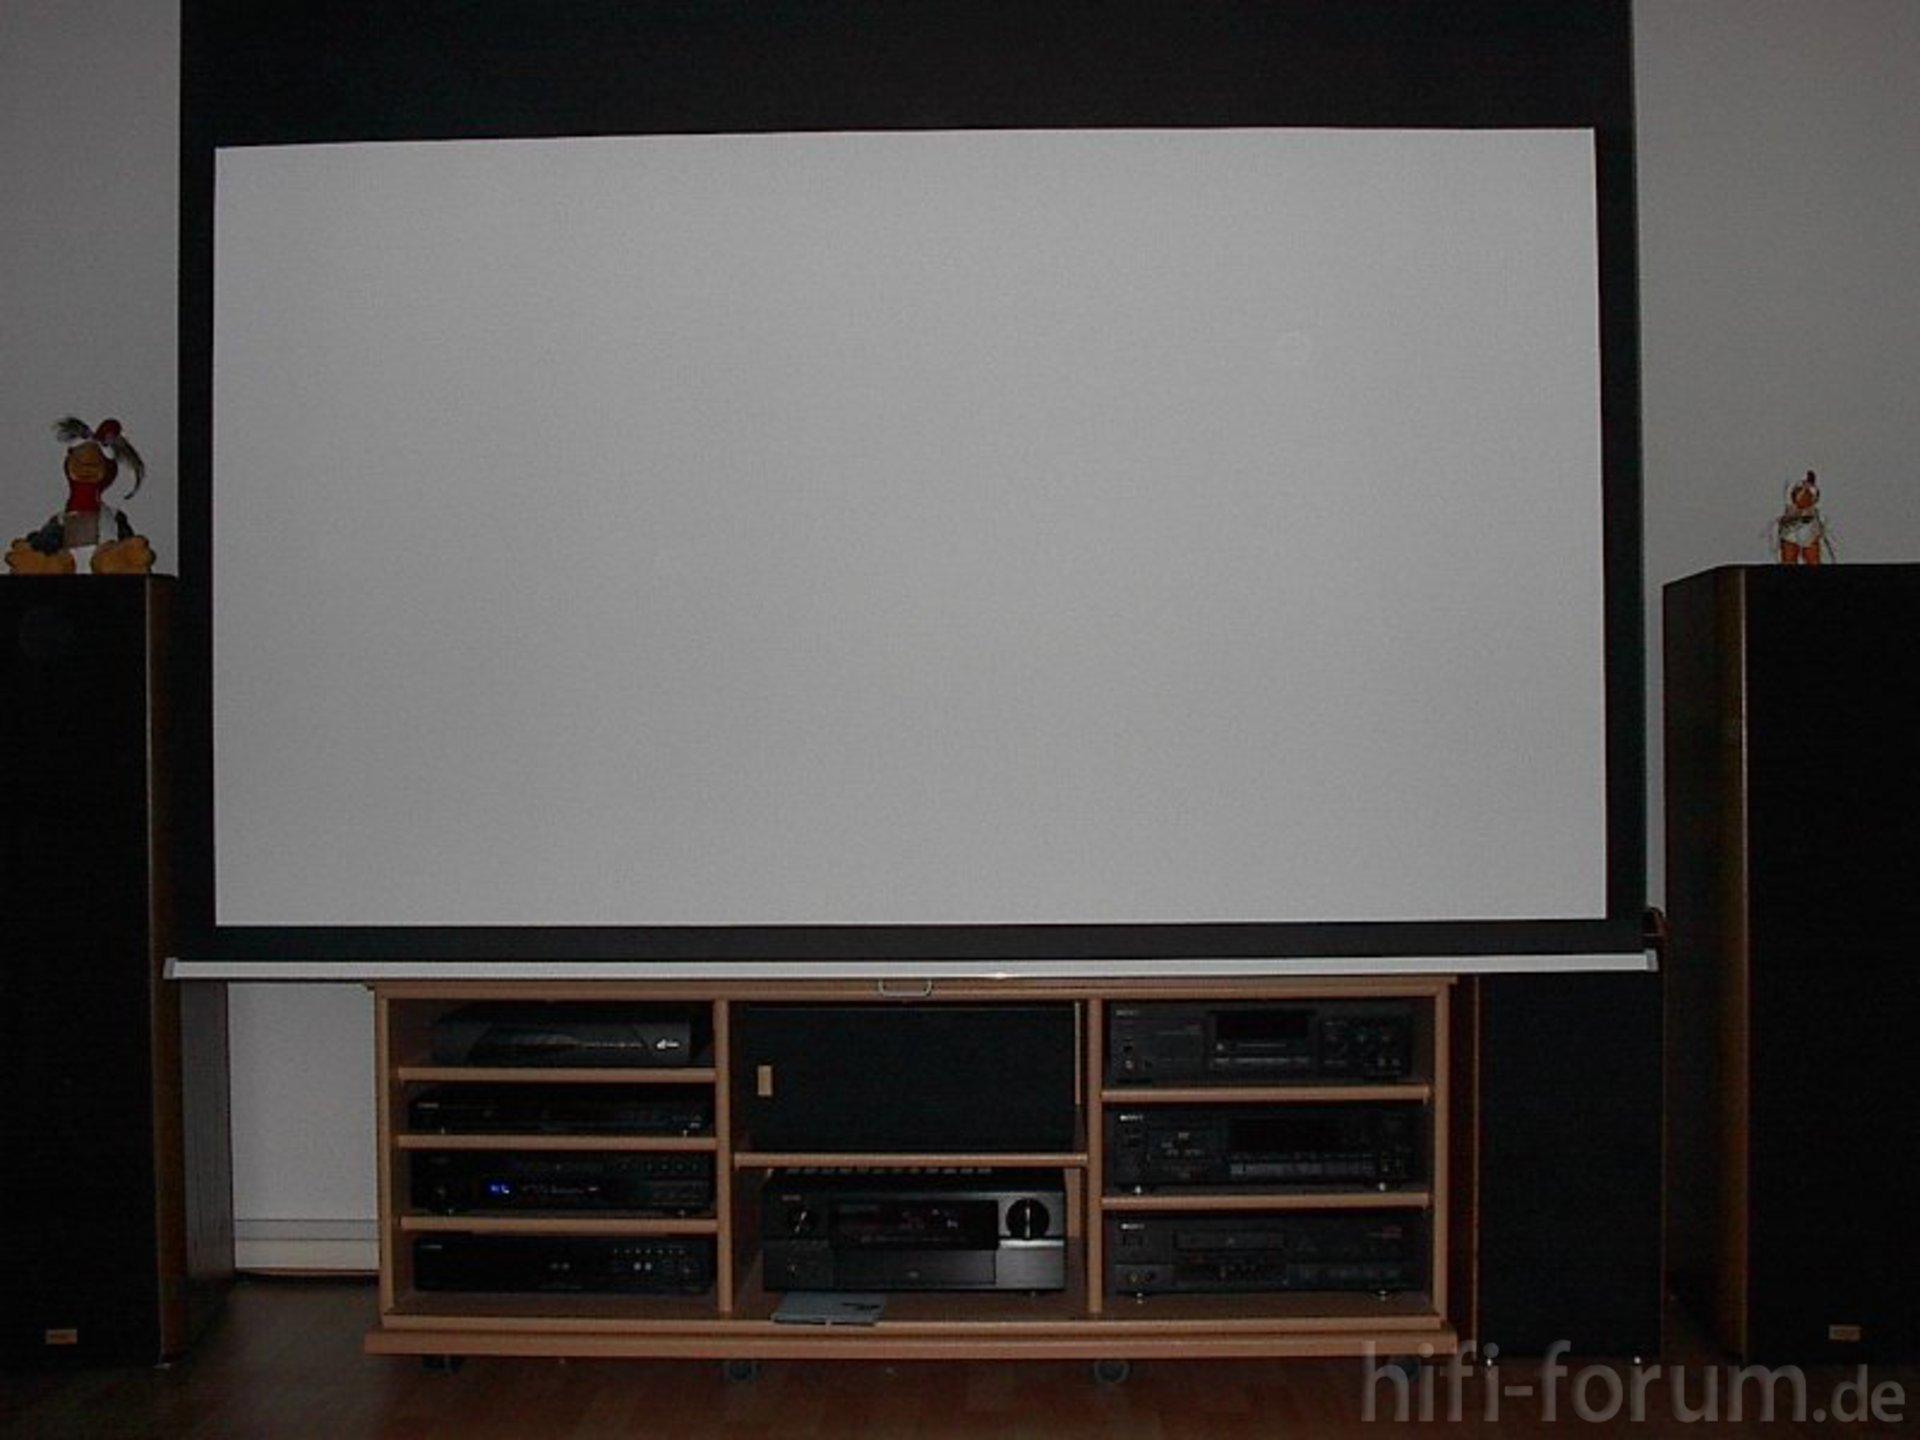 Leinwand leinwand tv hifi bildergalerie - Beamer leinwand selbstbau ...